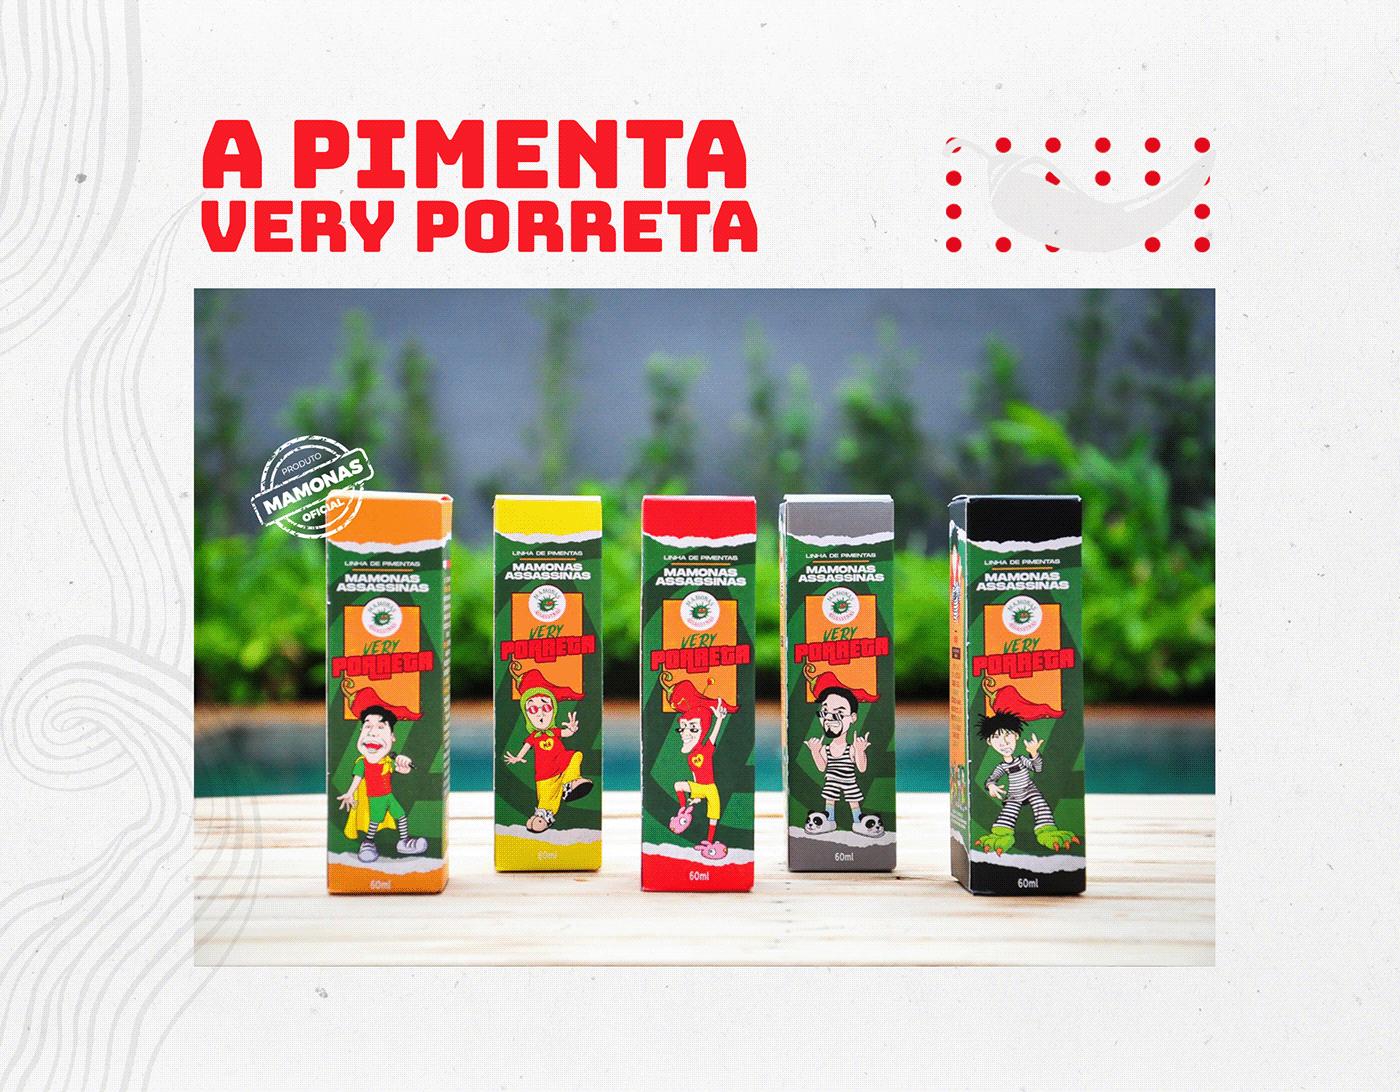 chili Chilli Beans design La pimi Mamonas Assassinas  Master Chefe molho de pimenta pepper sauce Pimenta